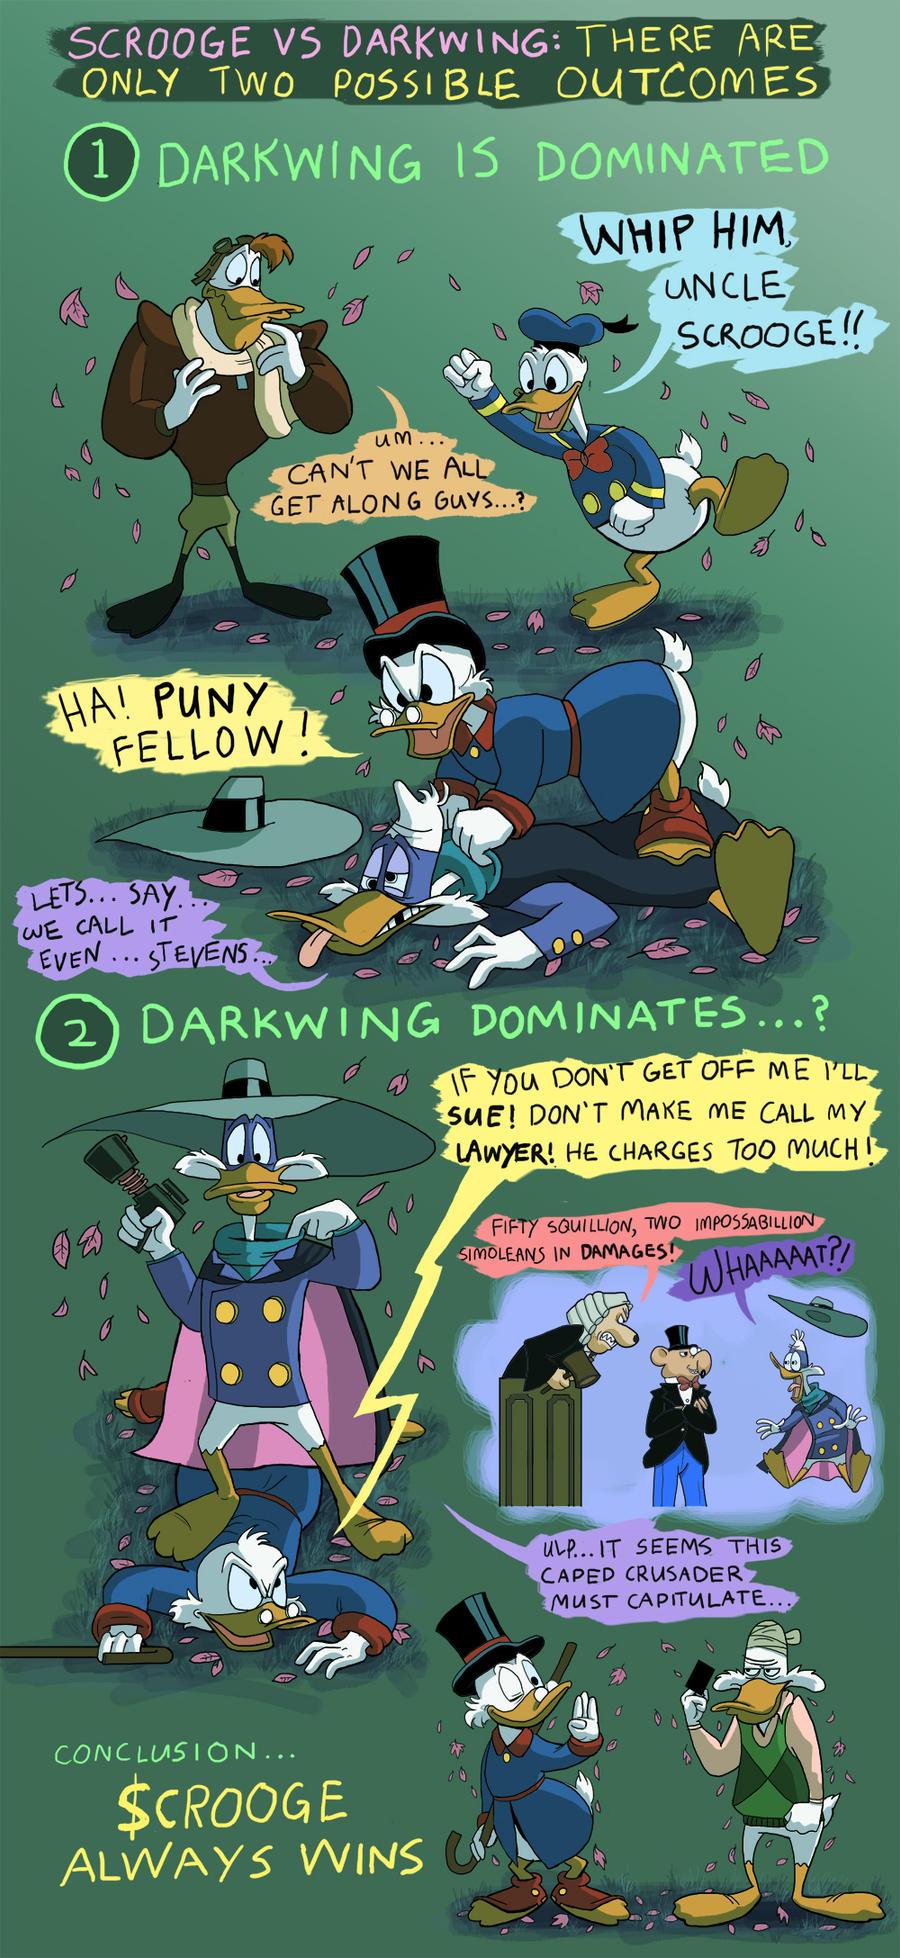 Scrooge McDuck vs Darkwing Duck: Conclusion by Xanadu7